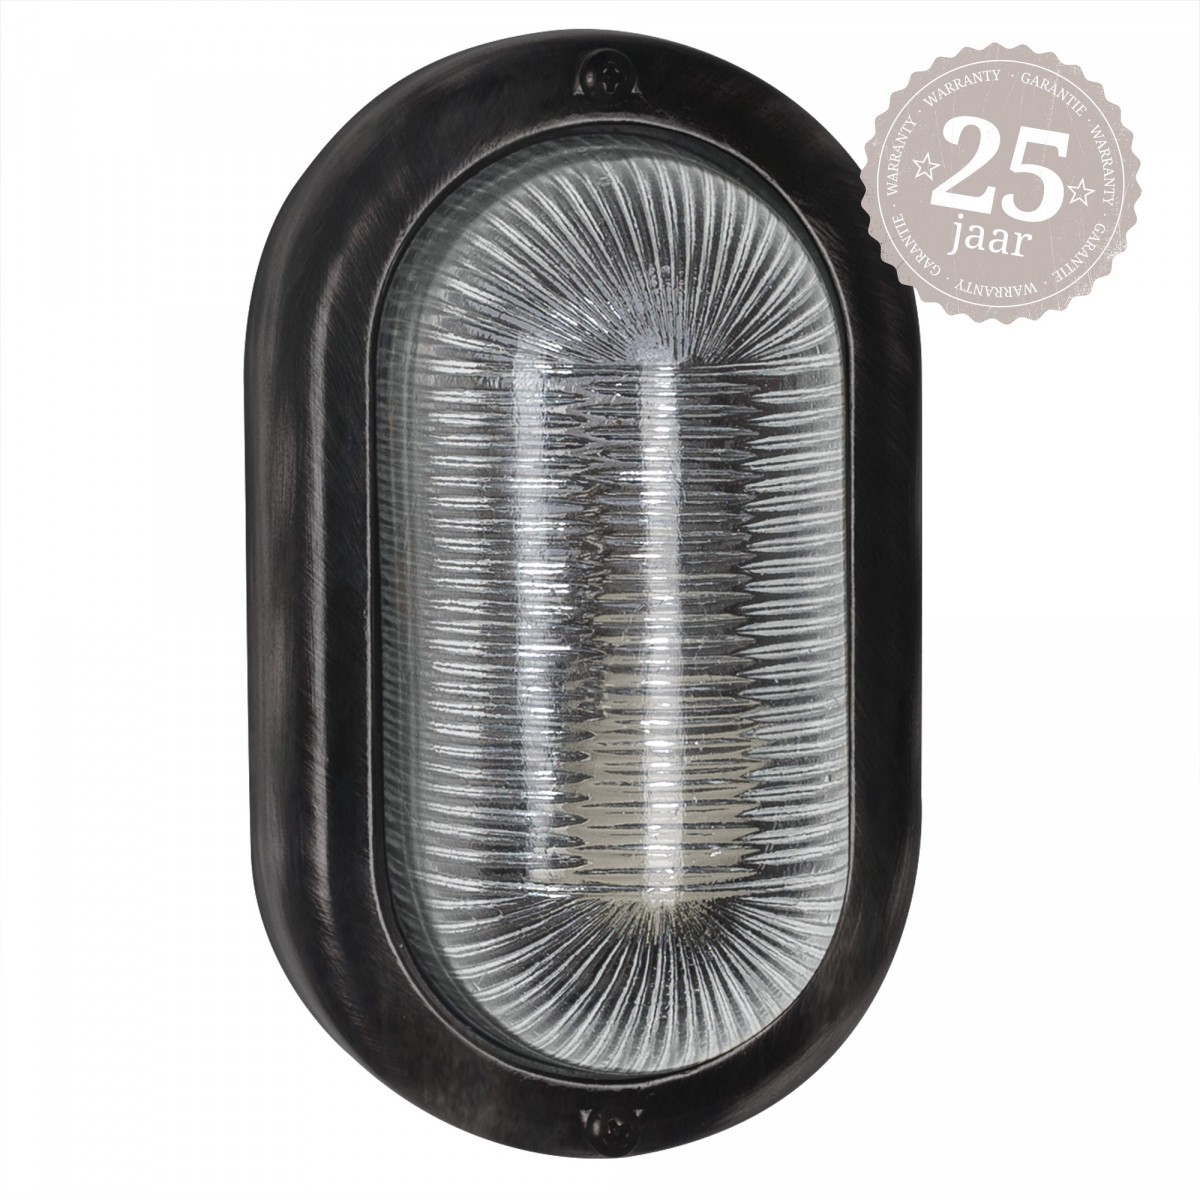 Ochi Zwart Brons (6680) - KS Verlichting - Maritiem